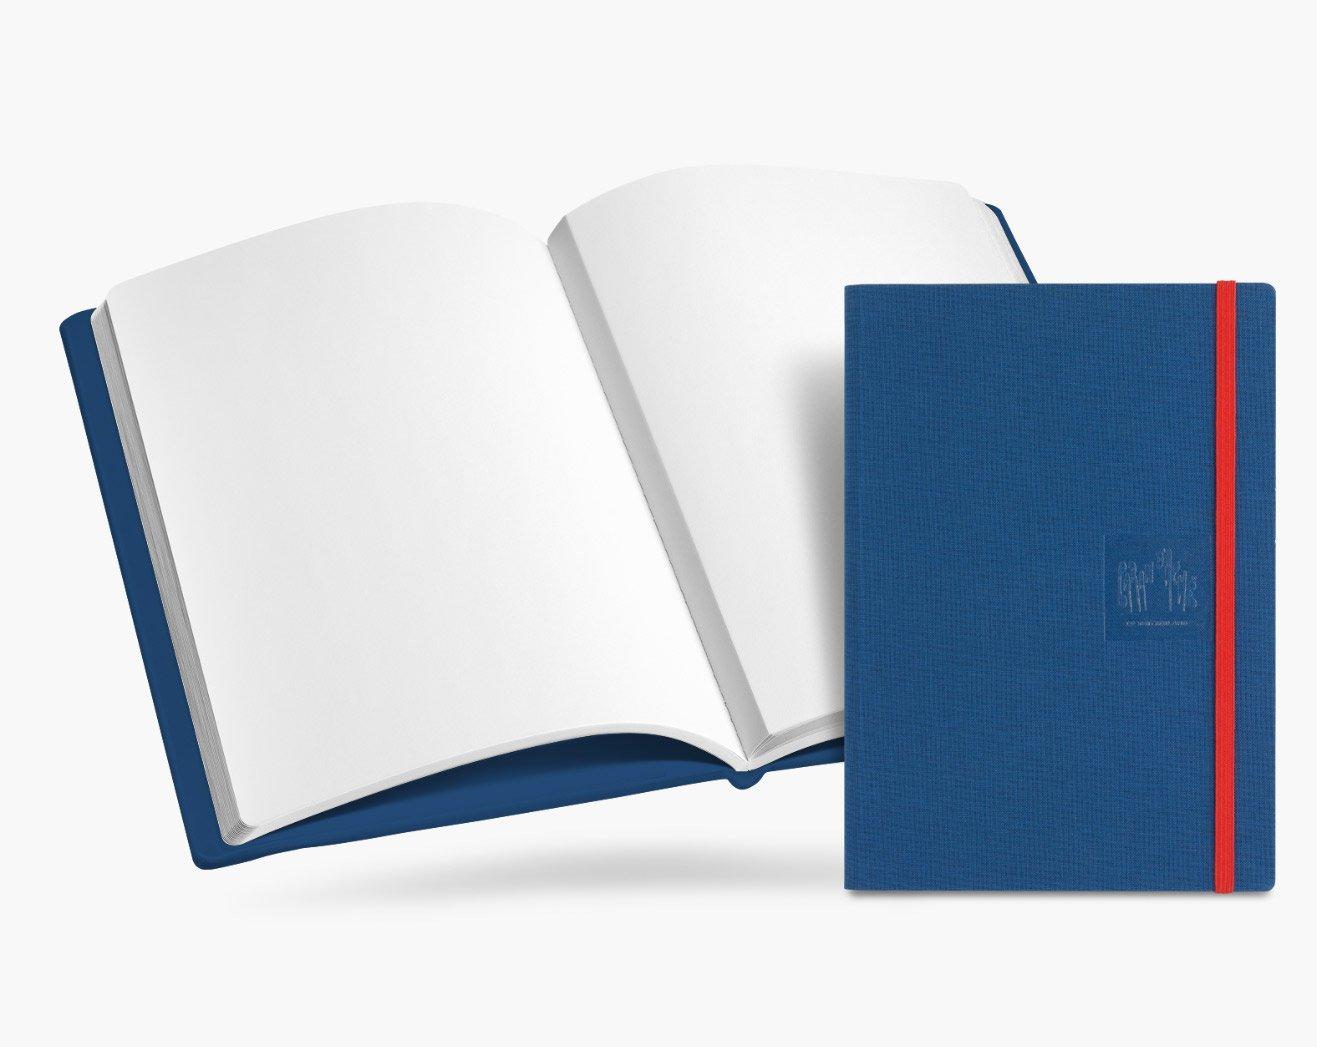 Caran d'Ache A5 Notebook lienzo en blanco Blu Cvr